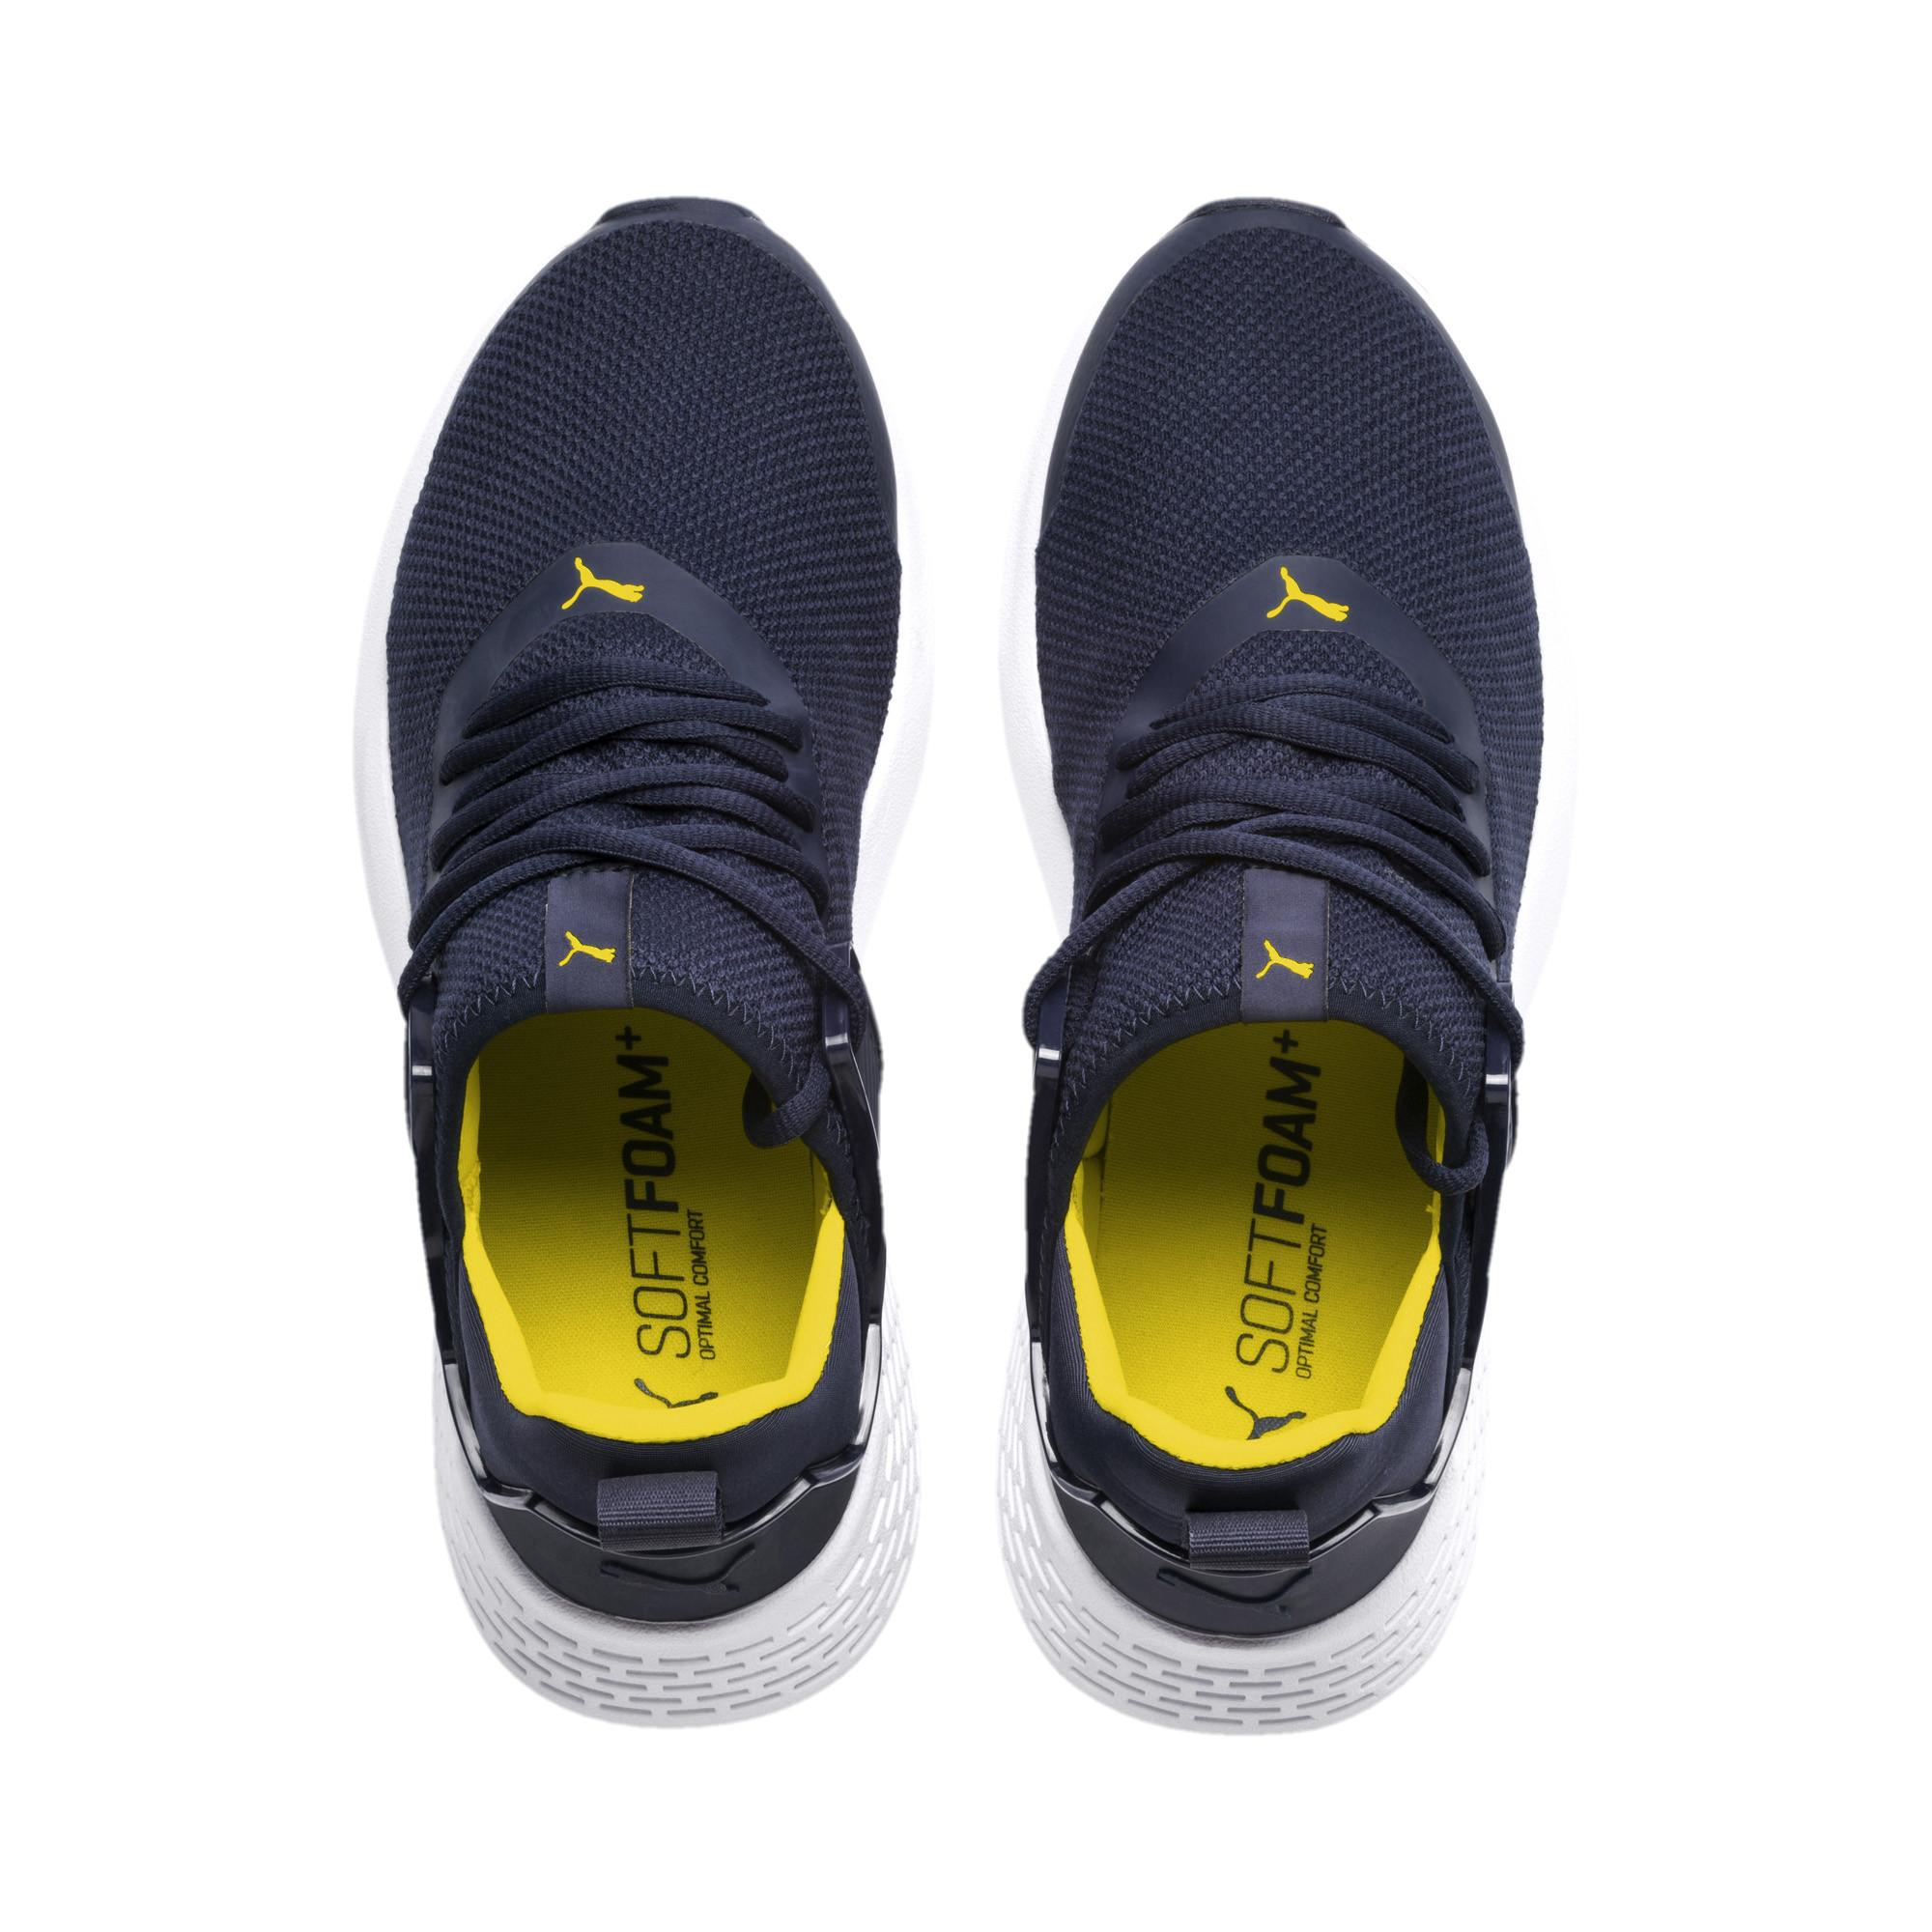 04642f54 PUMA Blue Insurge Mesh Sneakers for men